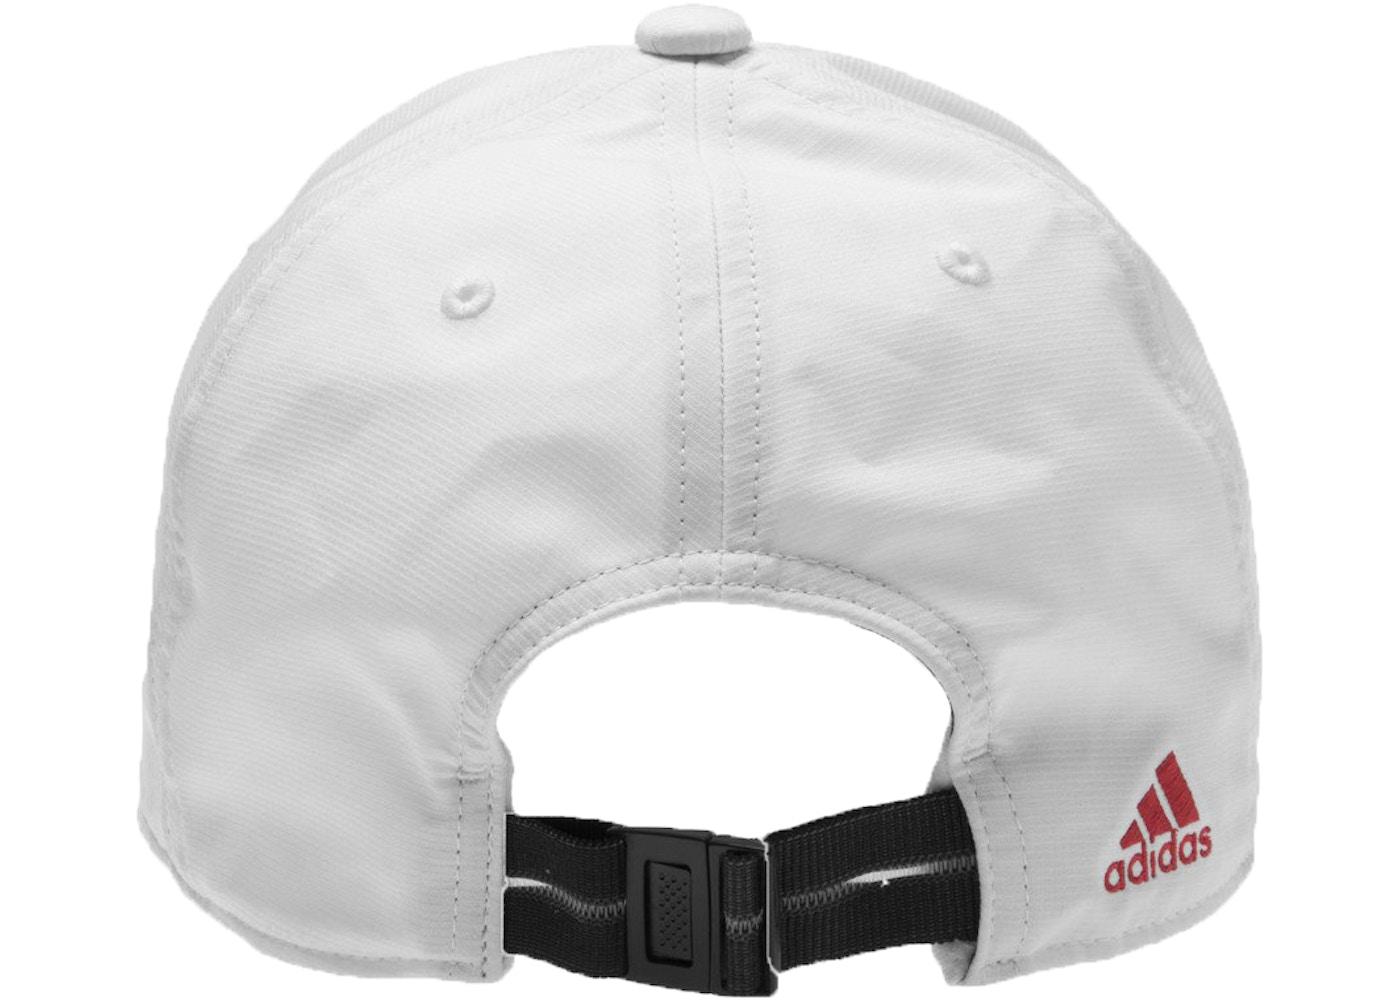 Kith adidas Soccer Cobras Cap White - SS17 b4da752fa67